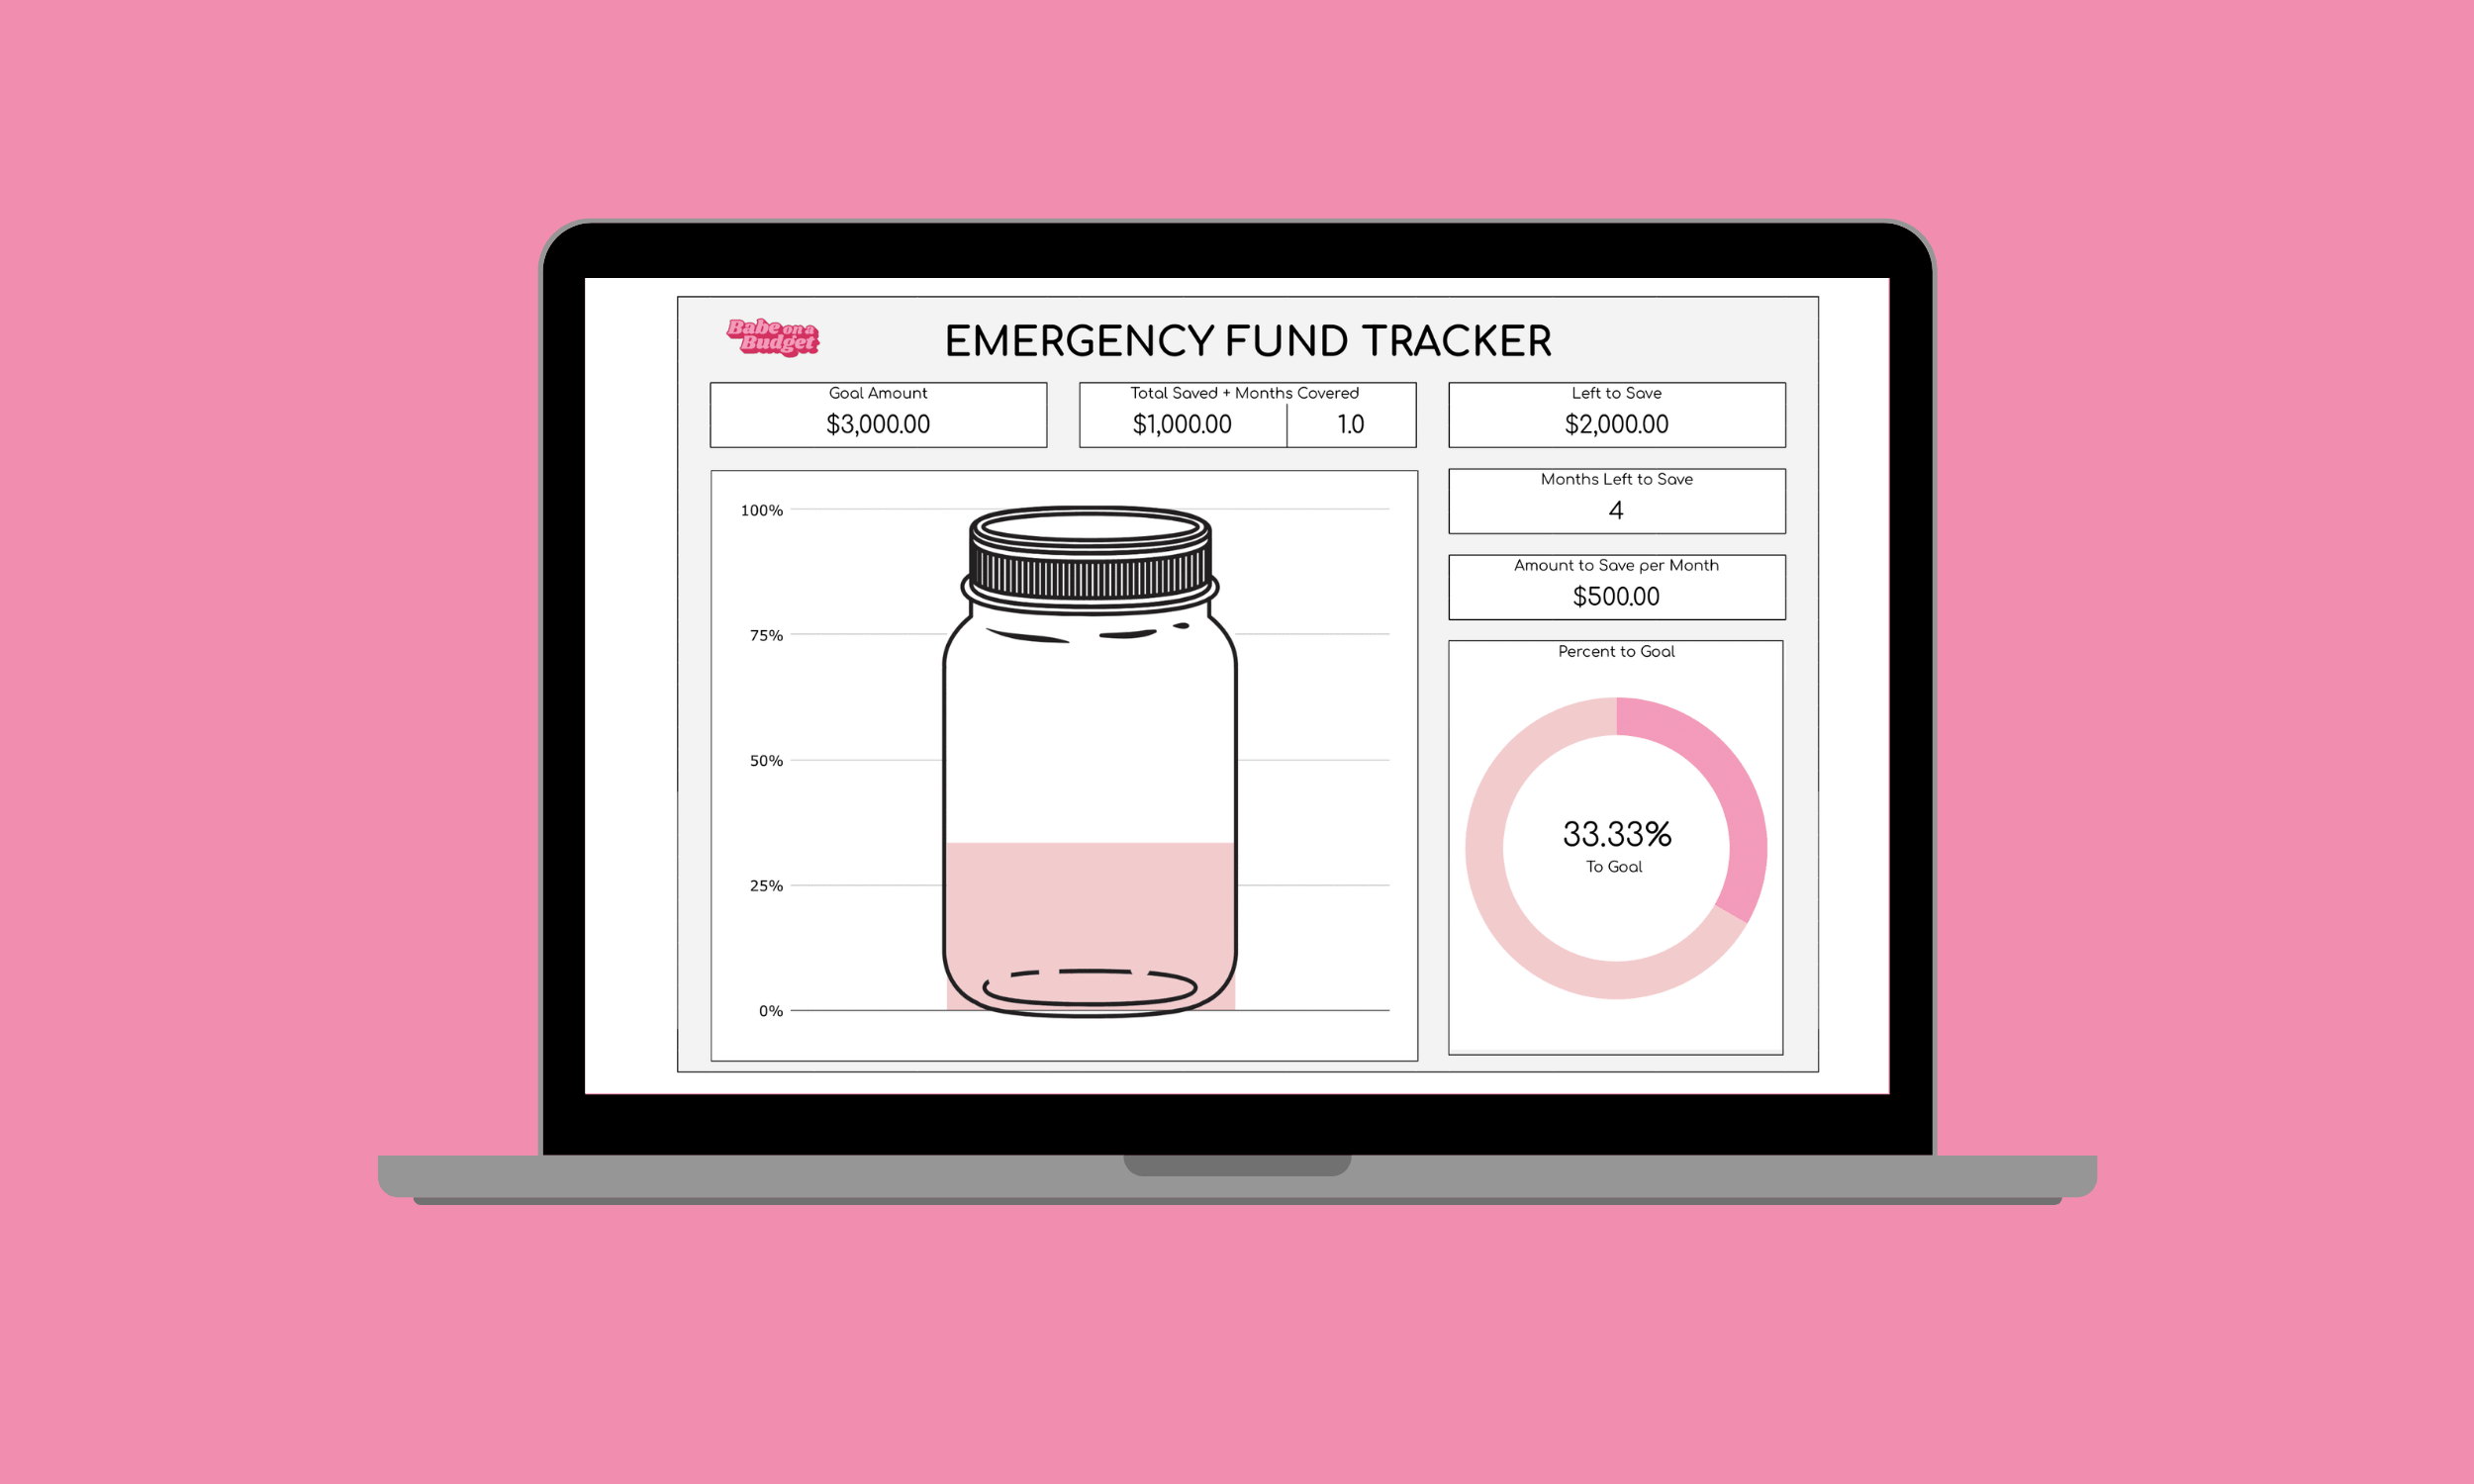 Emergency fund tracker image